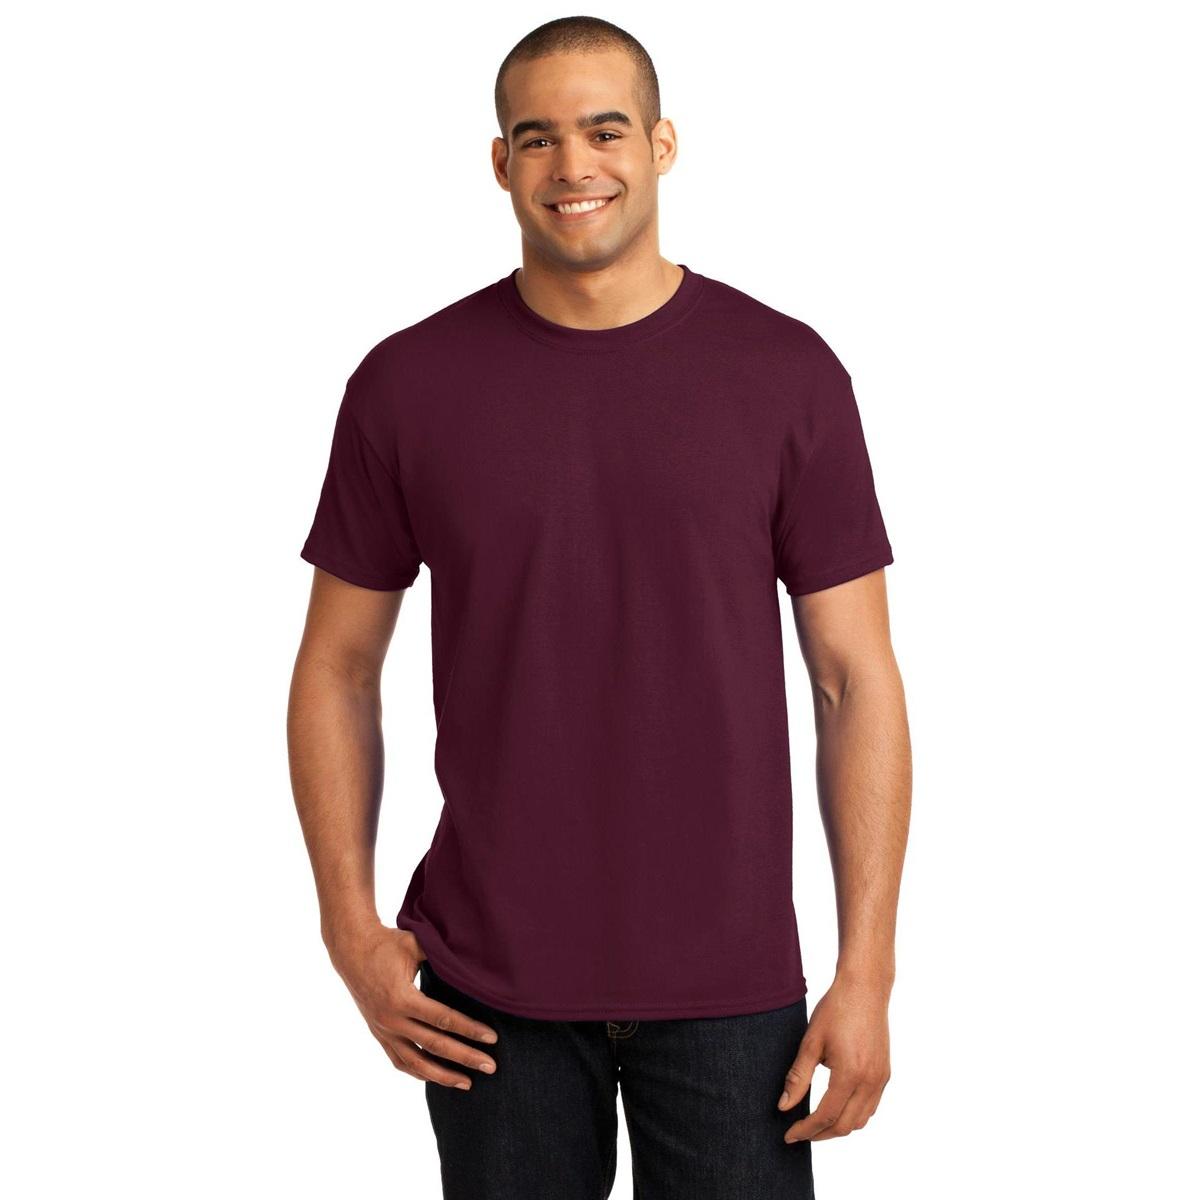 hanes 5170 comfortblend ecosmart cotton polyester t shirt maroon. Black Bedroom Furniture Sets. Home Design Ideas